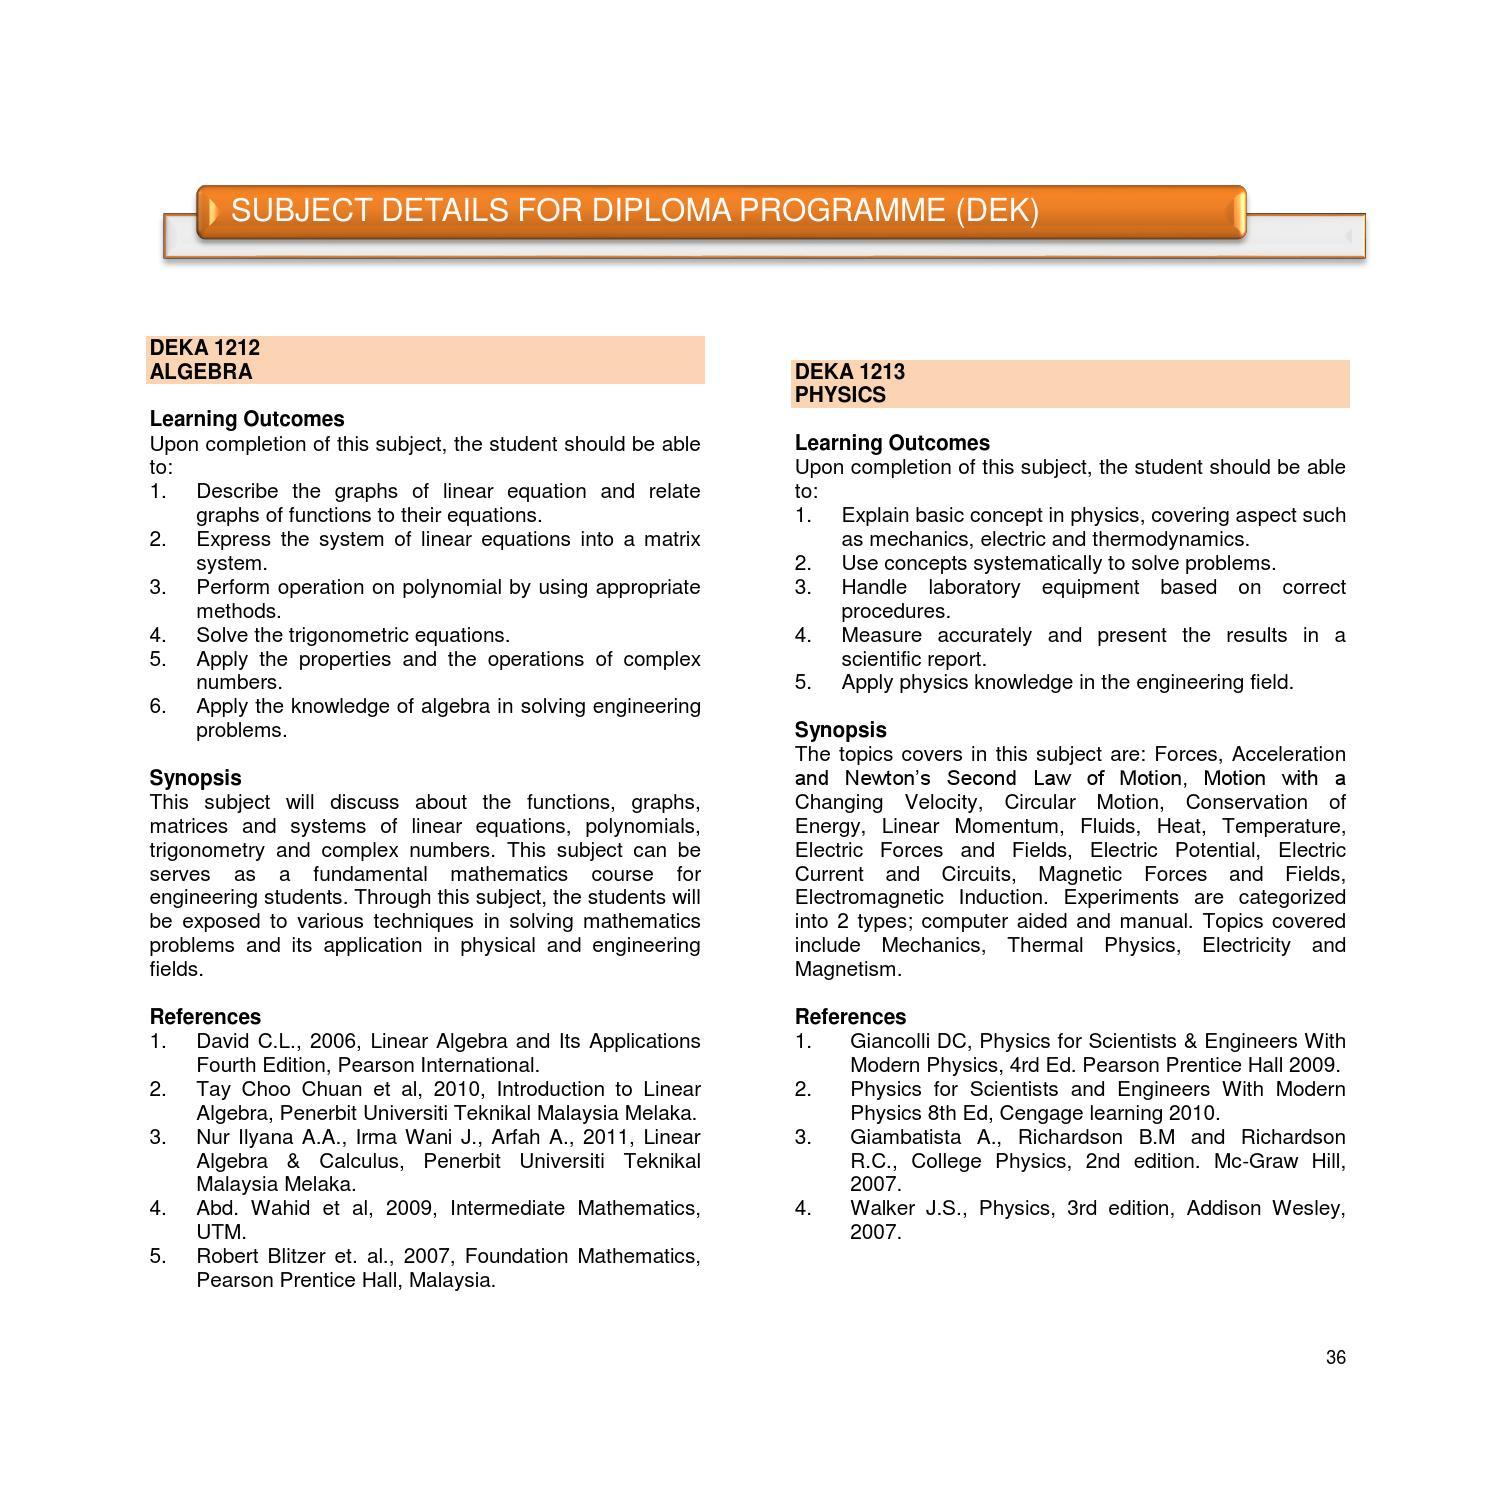 Handbook fke 20142015 by Vincent Loi - issuu